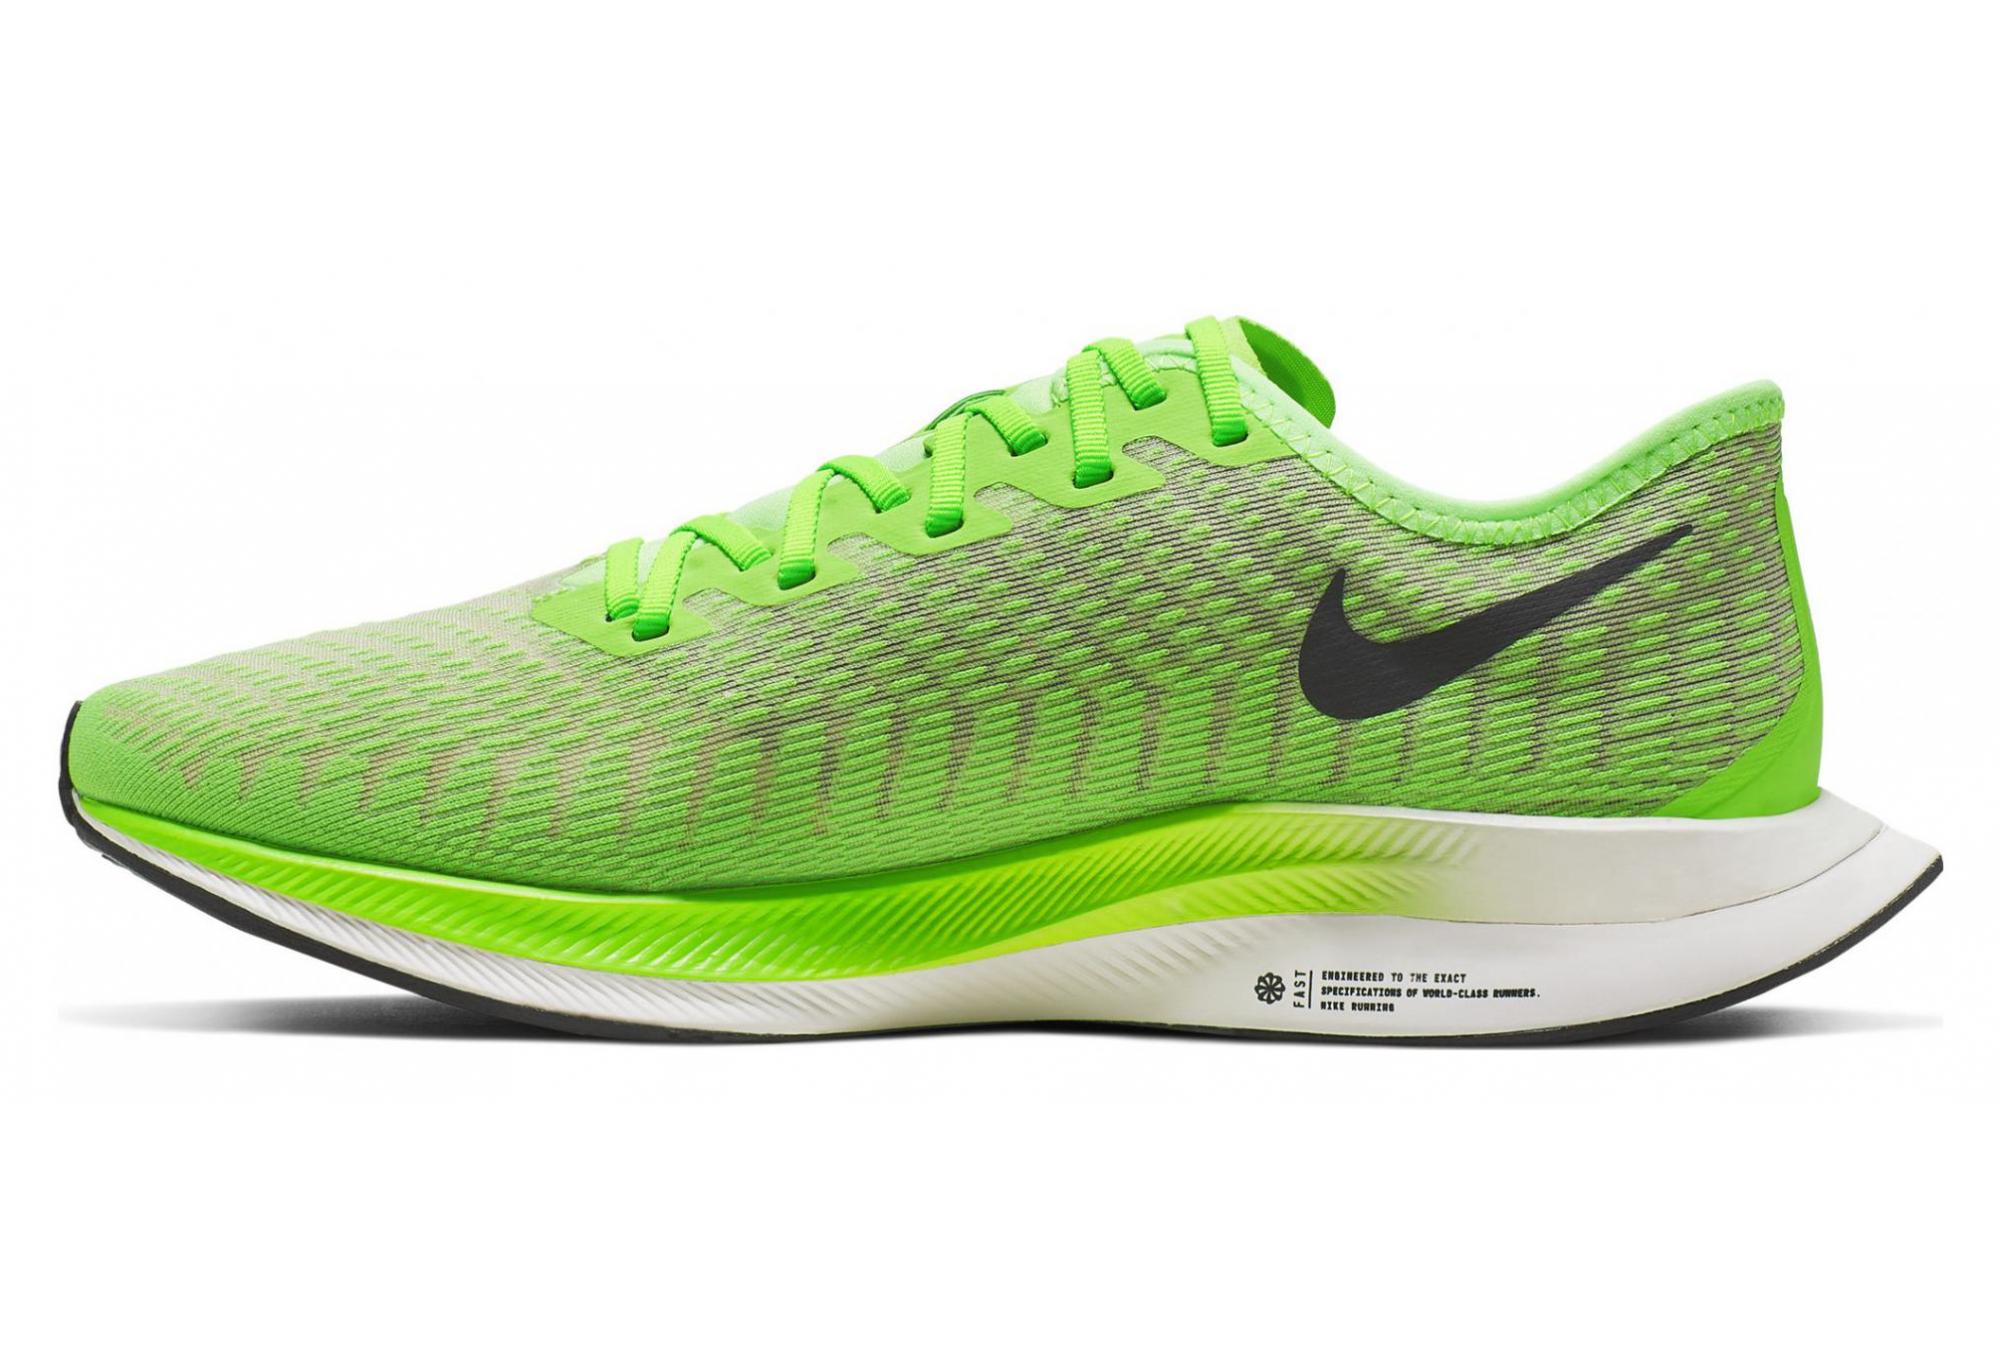 Chaussures de Running Nike Zoom Pegasus Turbo 2 Vert / Fluo ...